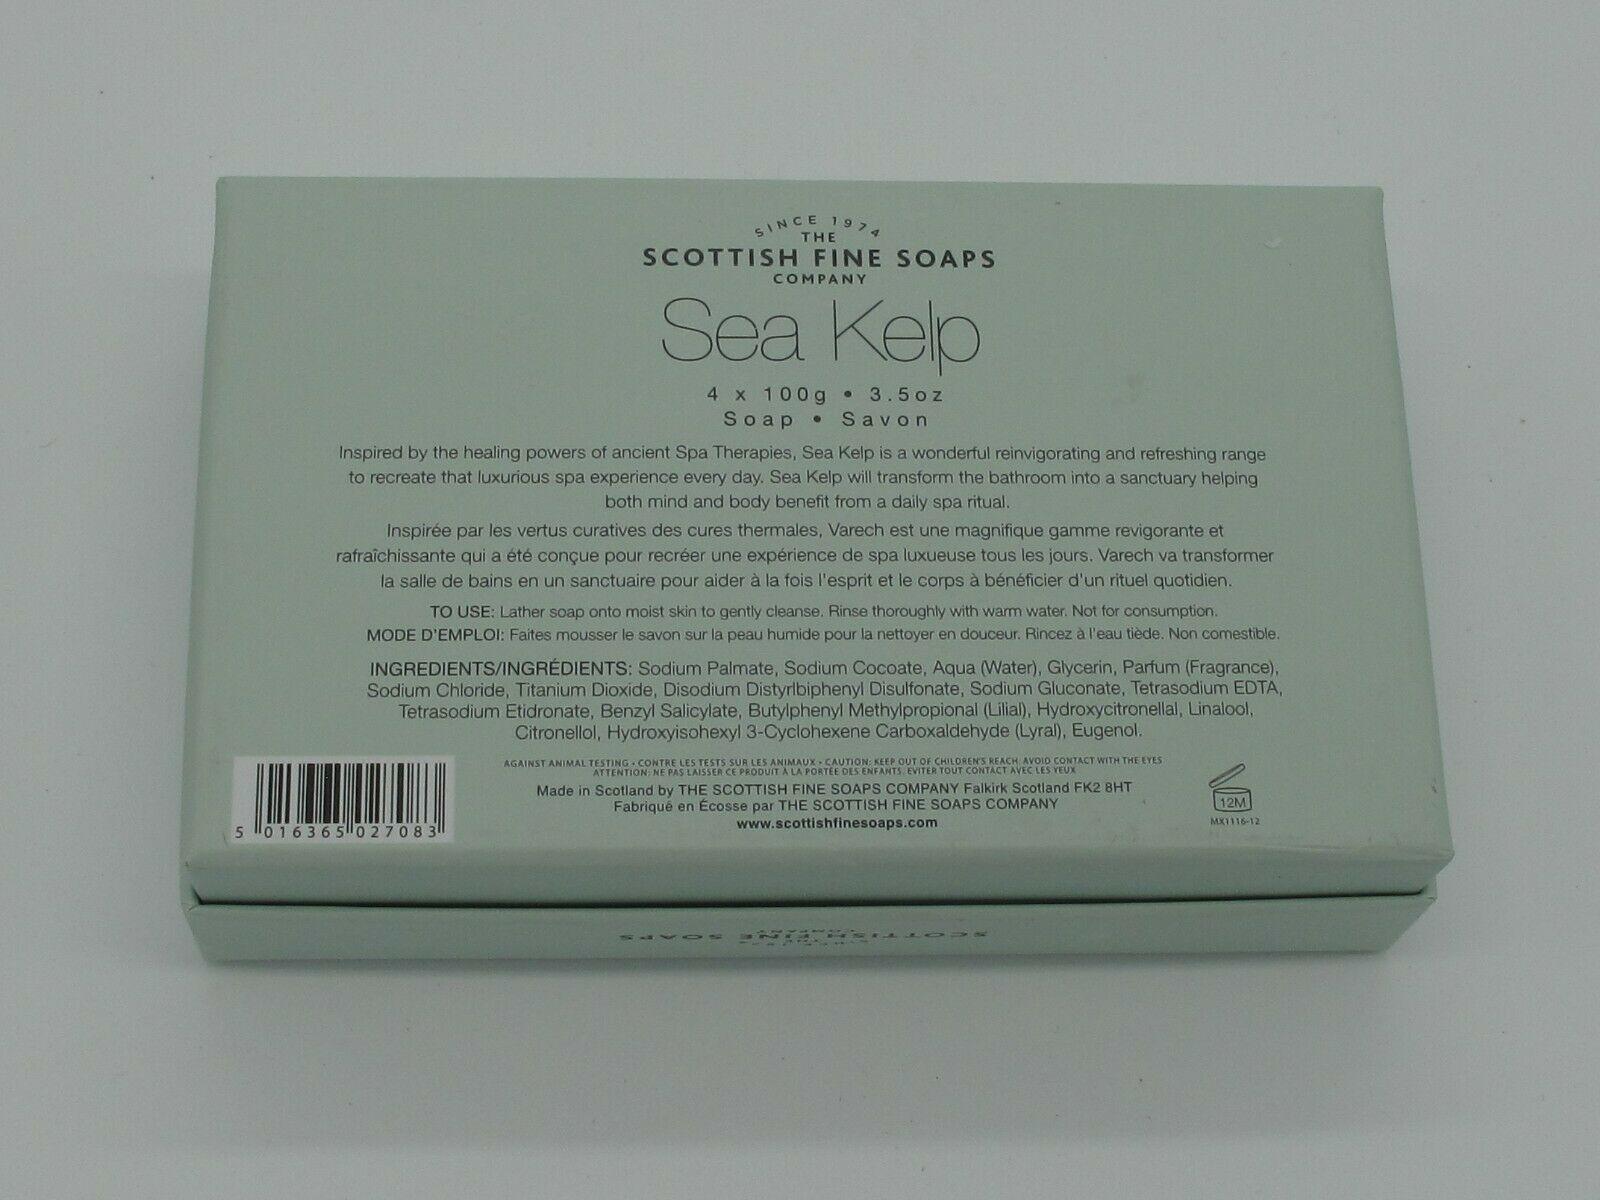 The Scottish Fine Soaps Sea Kelp Varech soap 4 x 100g 3.5 oz image 3